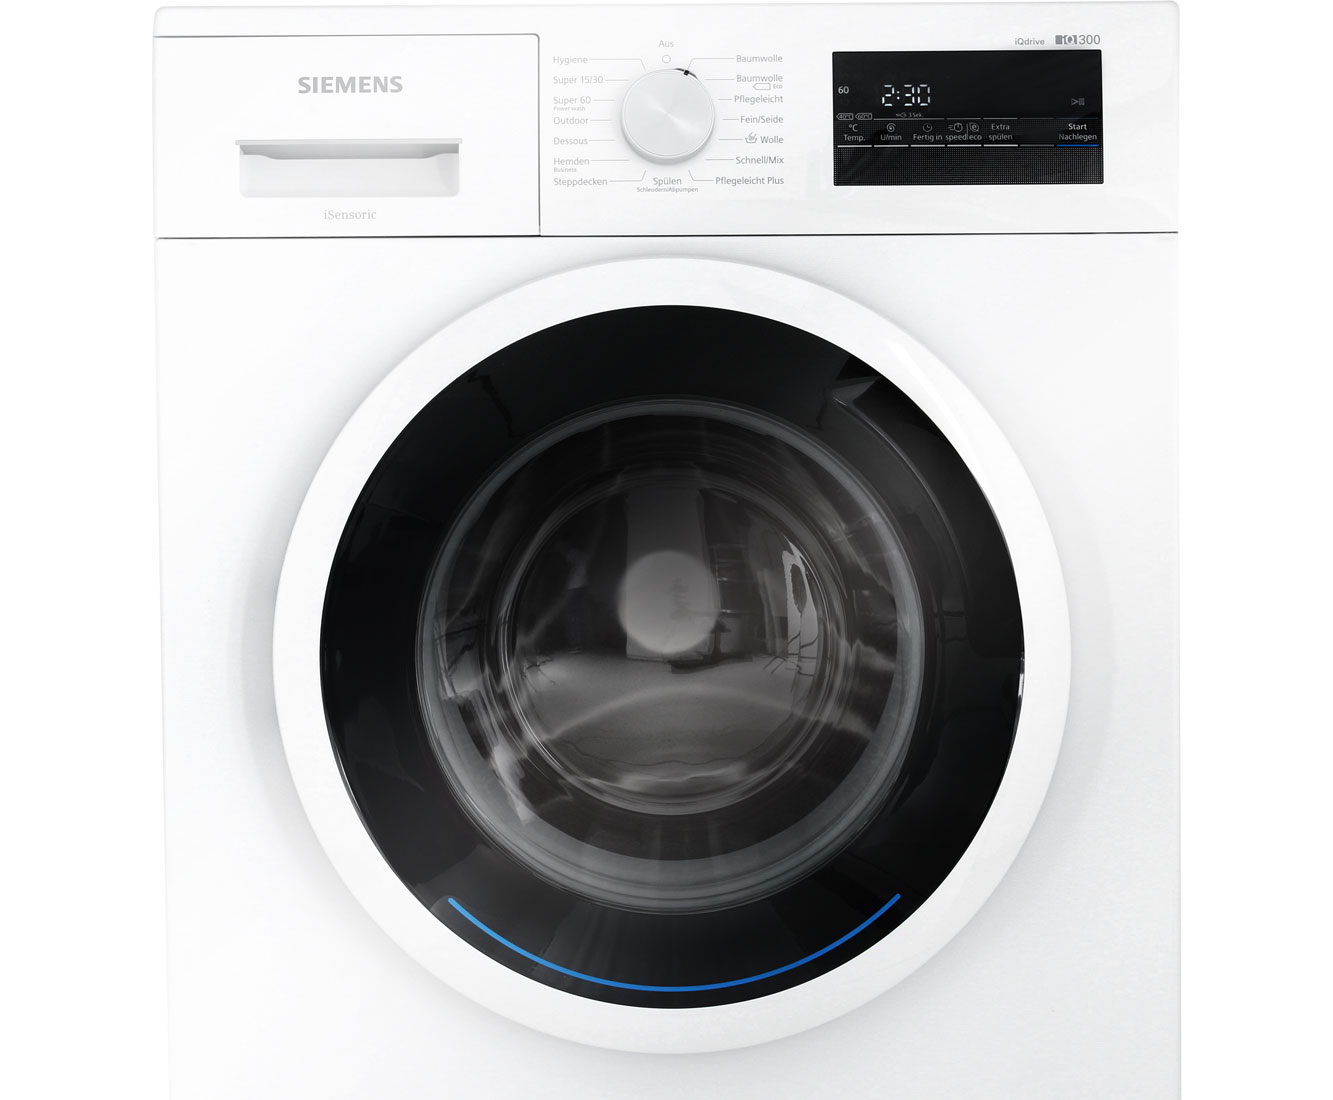 Siemens iq300 wm14n121 waschmaschine 7 kg 1400 u min a